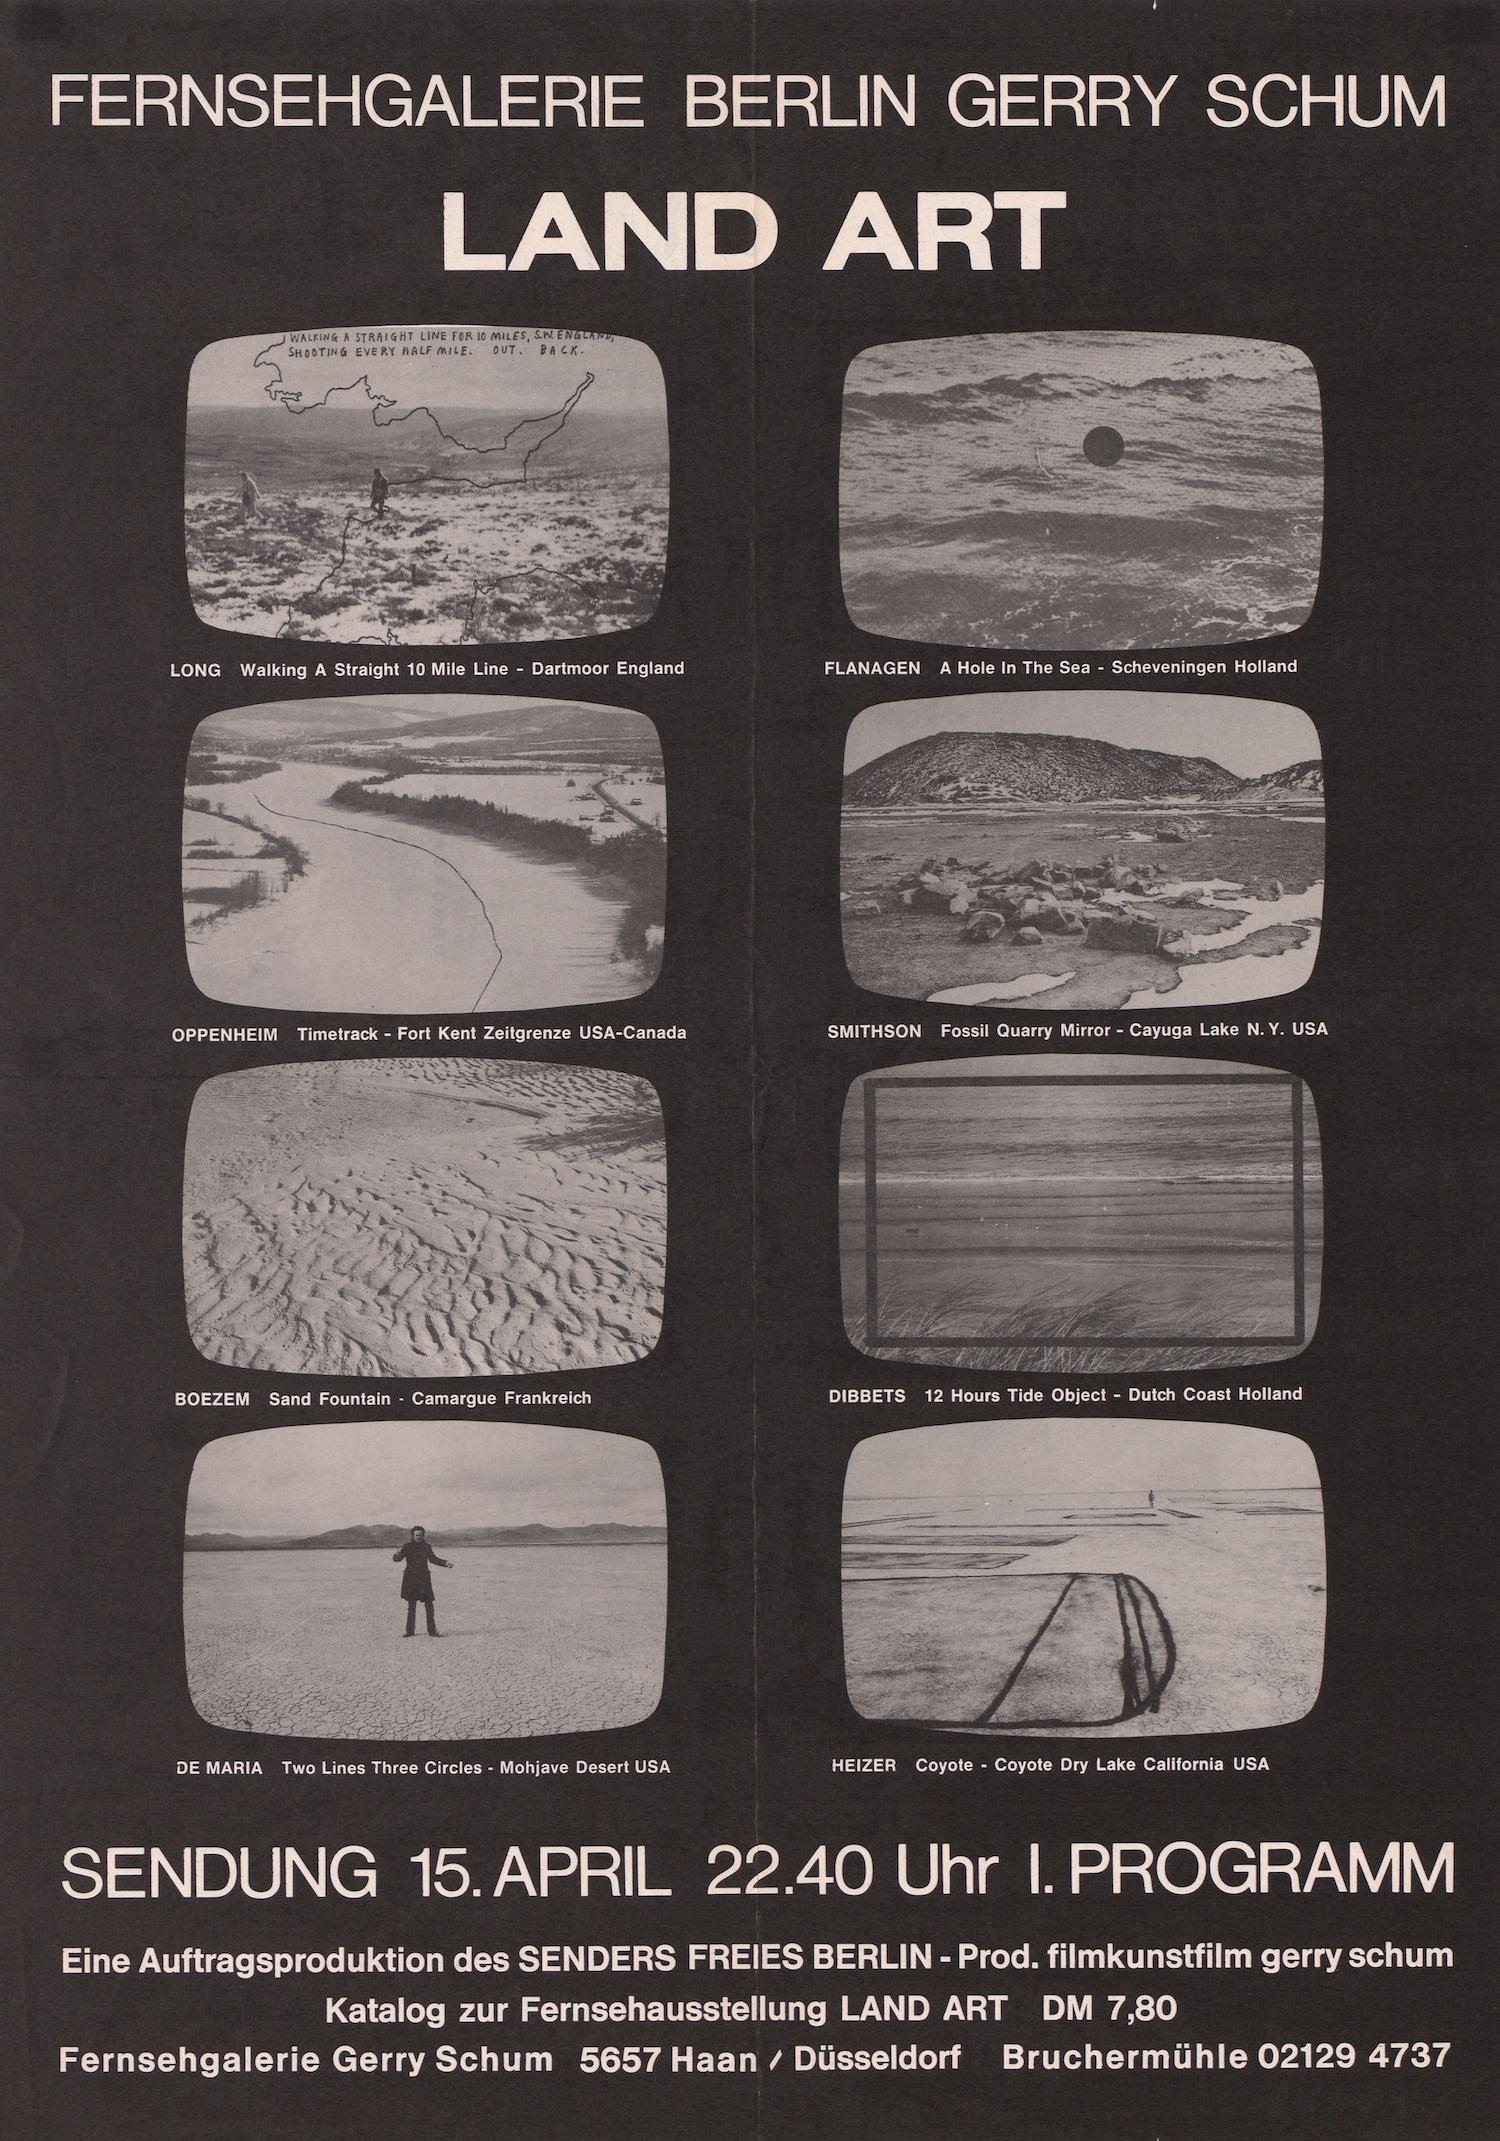 Gerry Schum, Fernsehgalerie Berlin, Land Art, Sender Freies Berlin, 1969 (Poster); Sammlung Marzona, Kunstbibliothek – Staatliche Museen zu Berlin